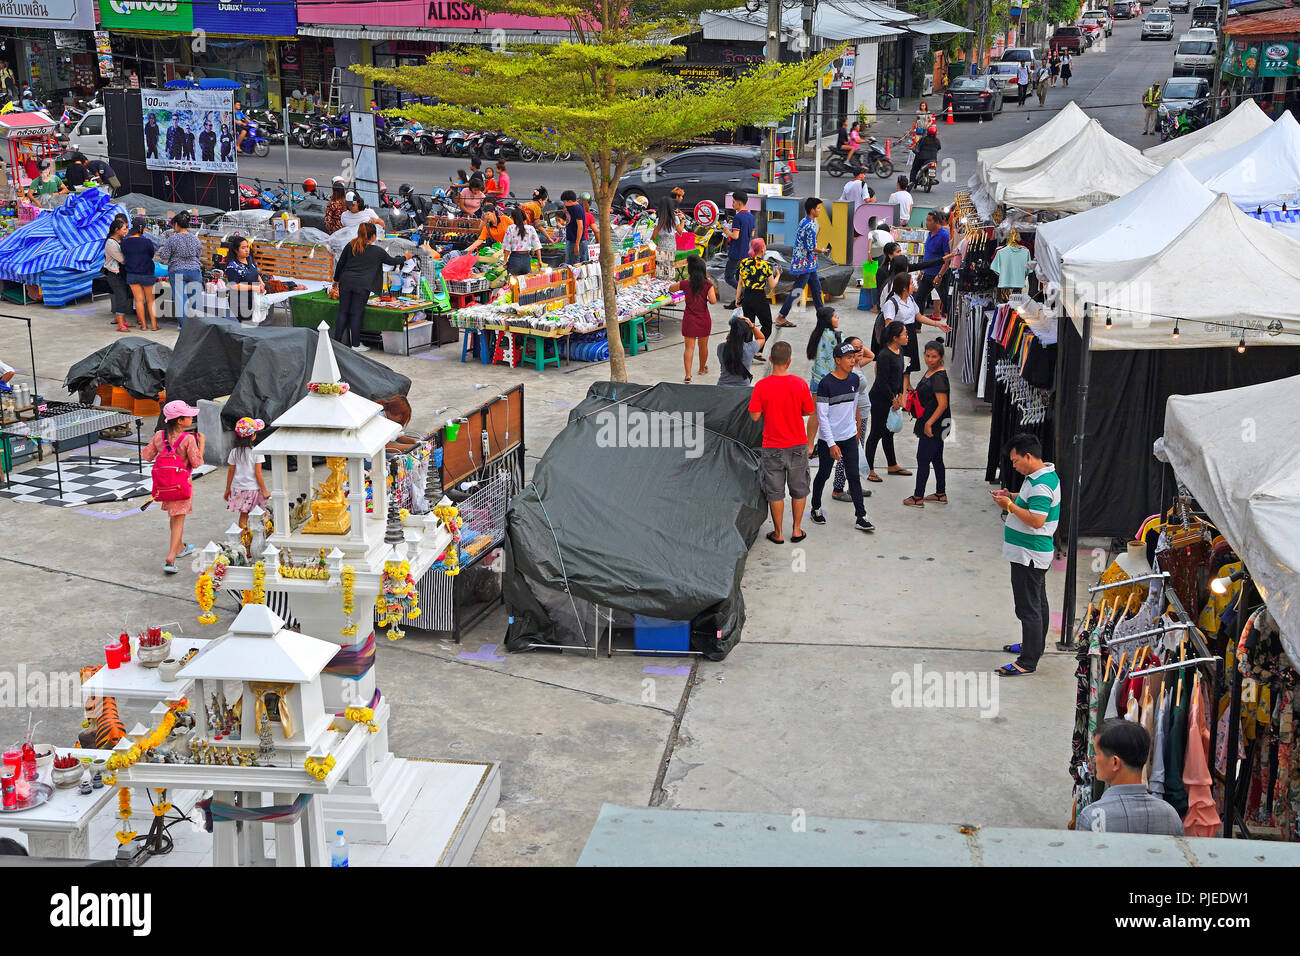 Look about the Chillva market, Phuket, Thailand, Blick über den Chillva Markt - Stock Image